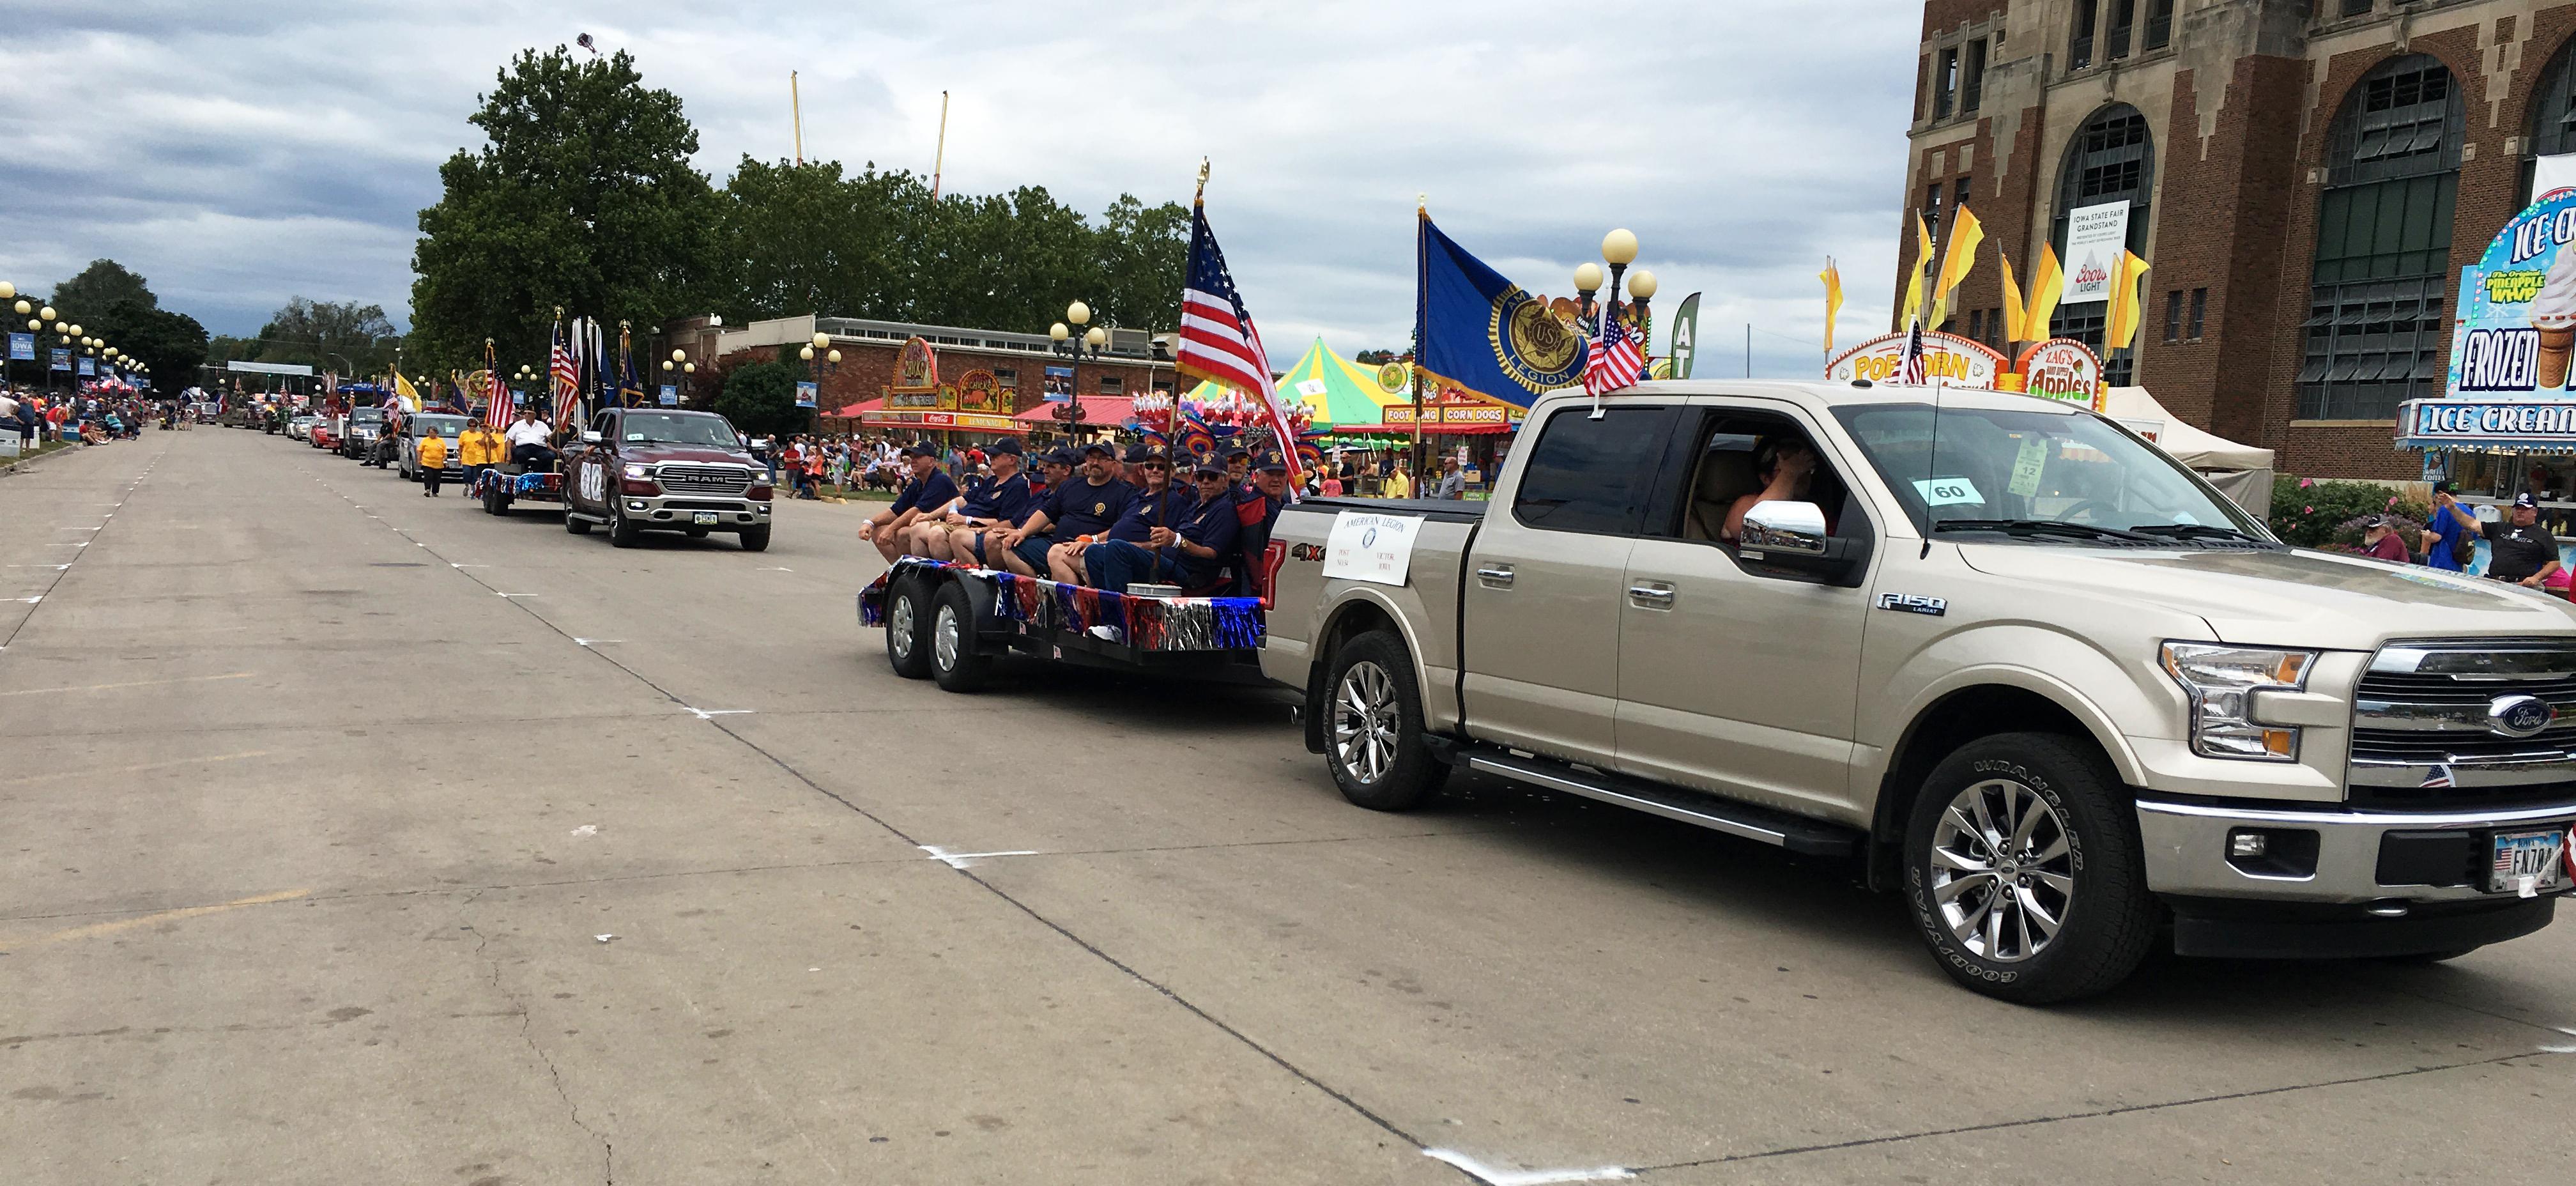 Walk for Veterans - The American Legion of Iowa